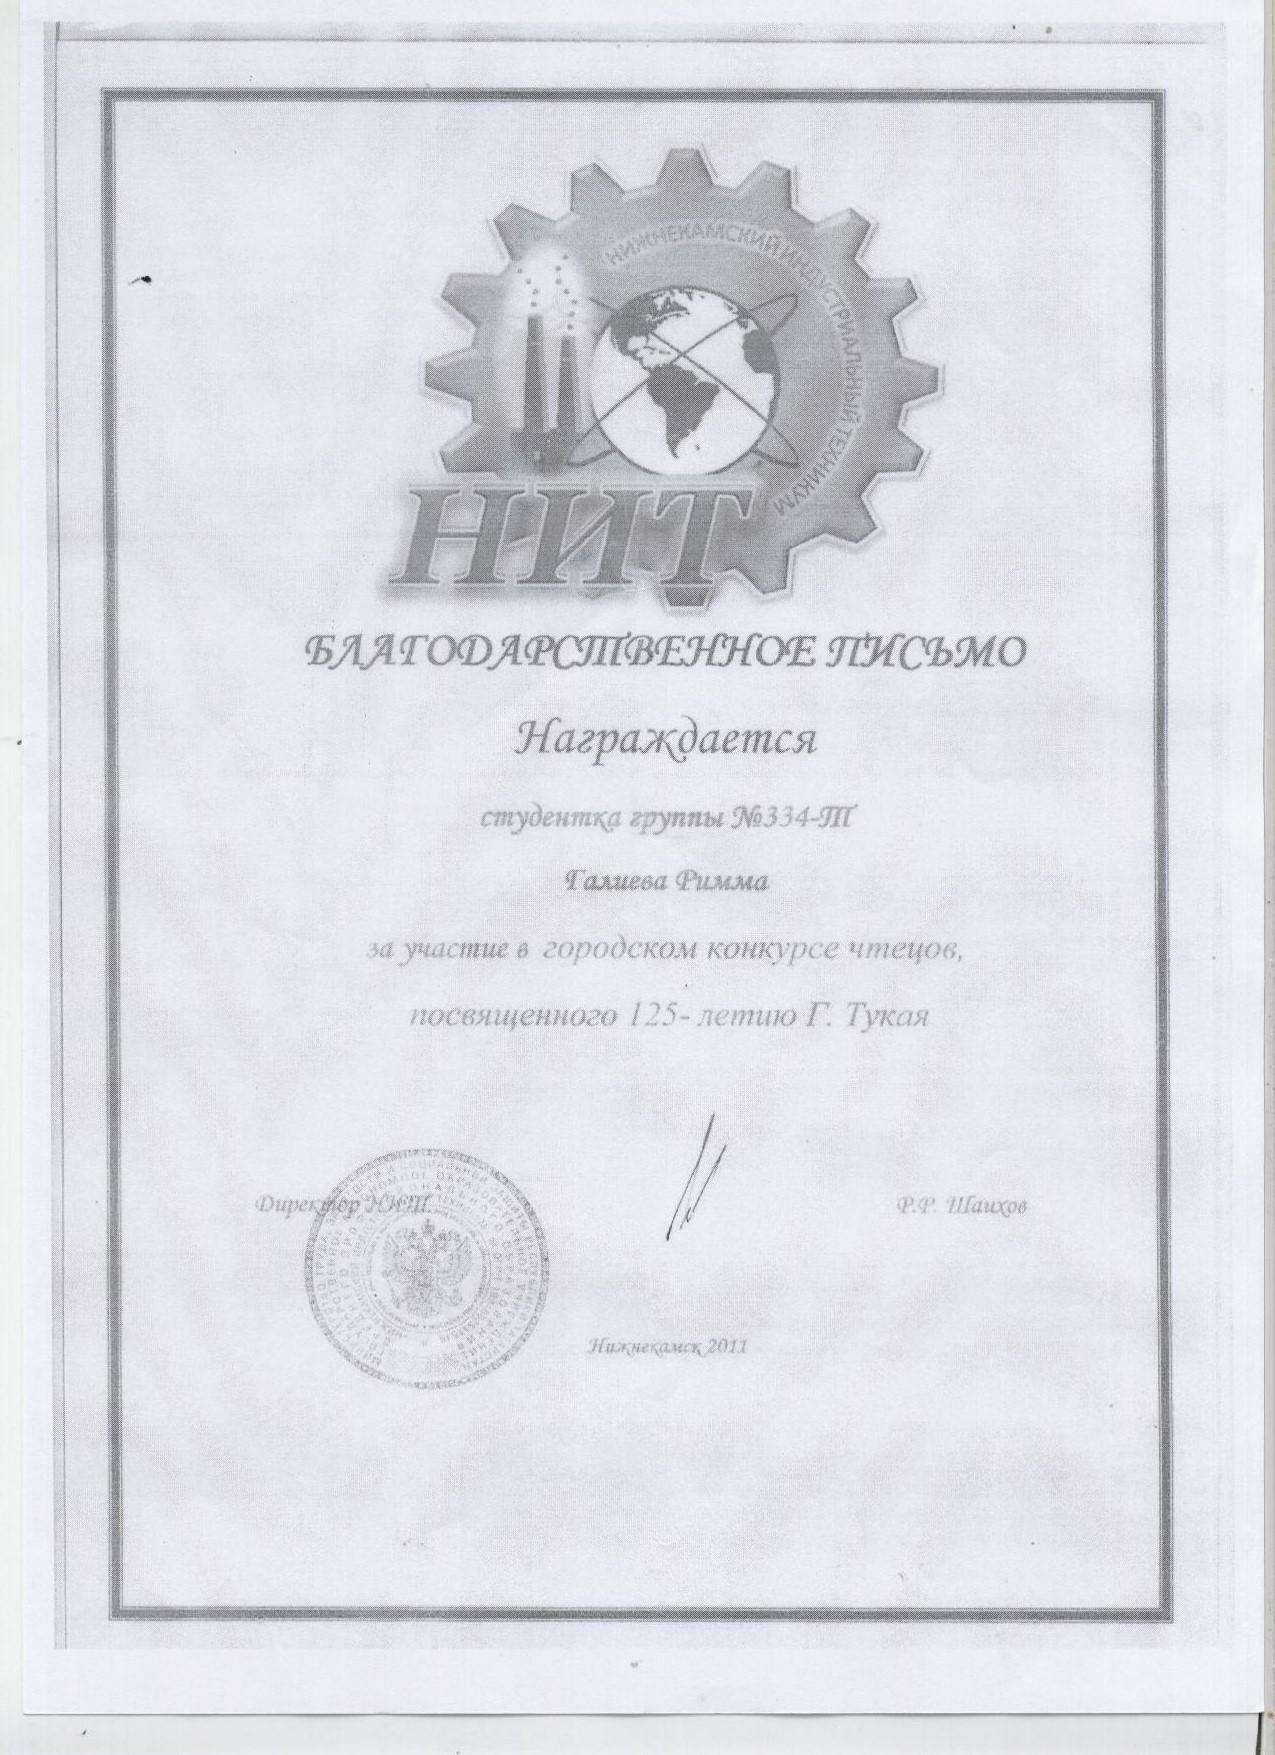 F:\Всероссйский конкурс Портфолио выпускника\РИММА\Римма 008.jpg